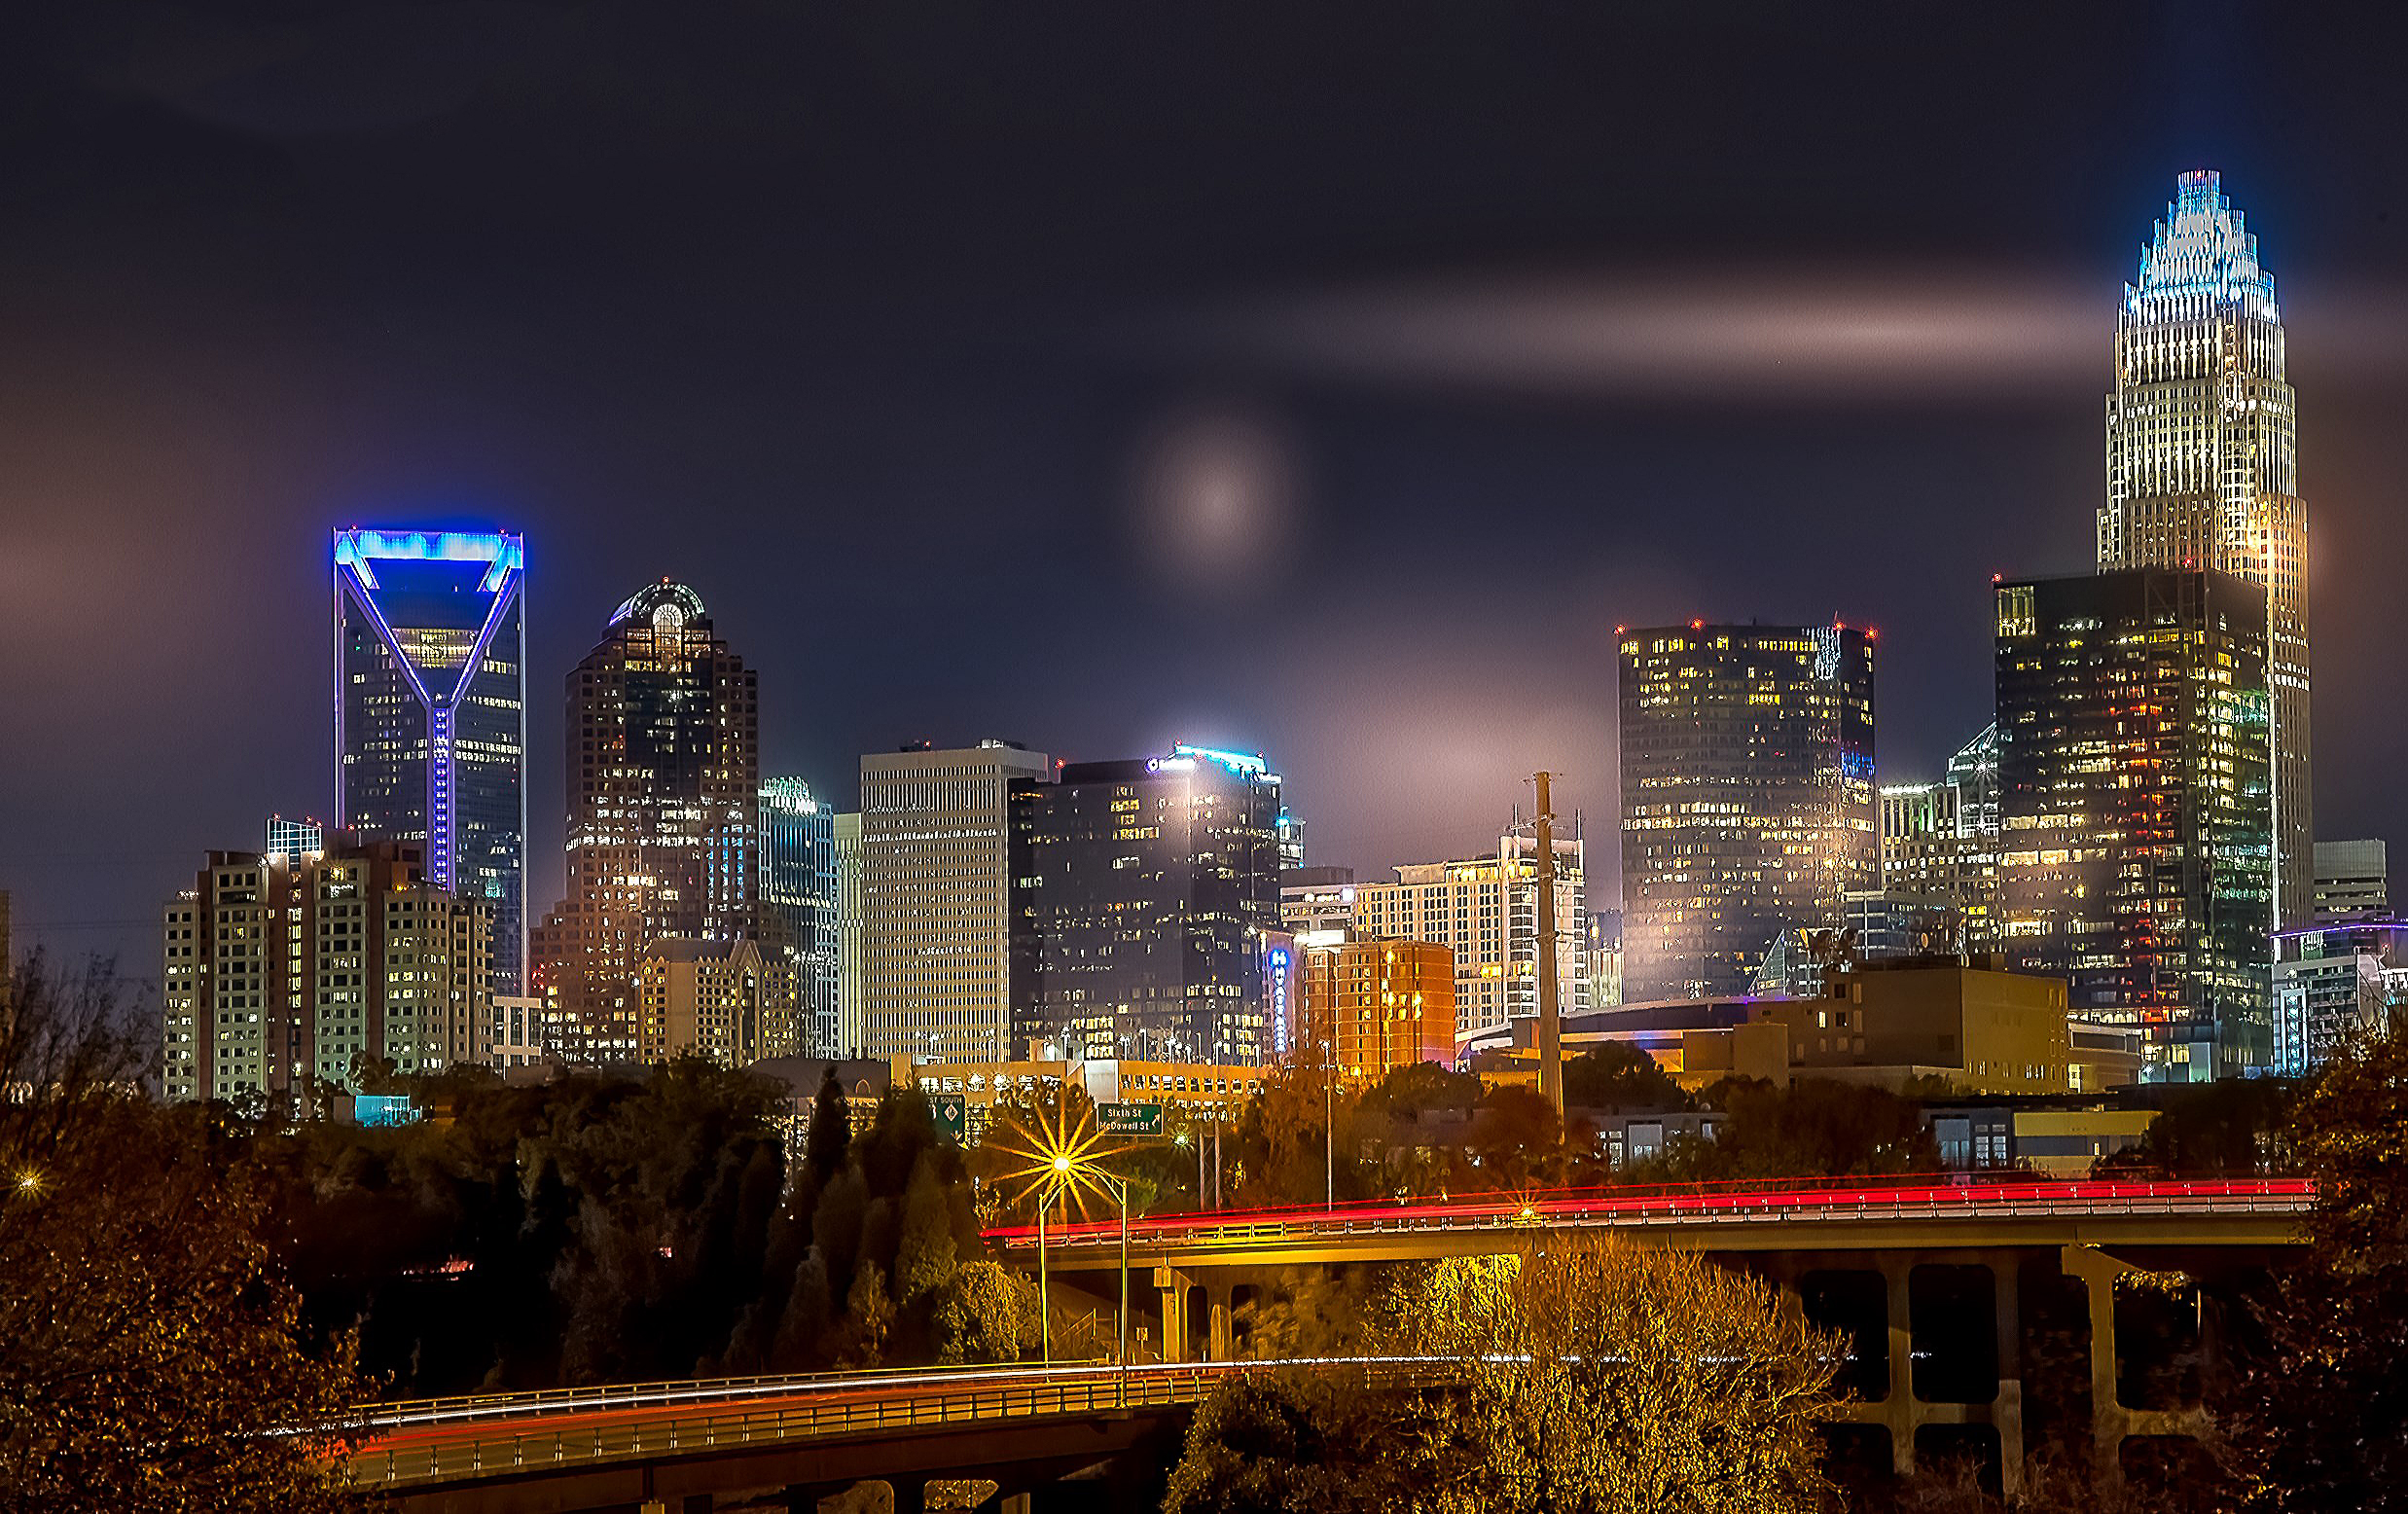 58084F - Charlotte Skyline at Night